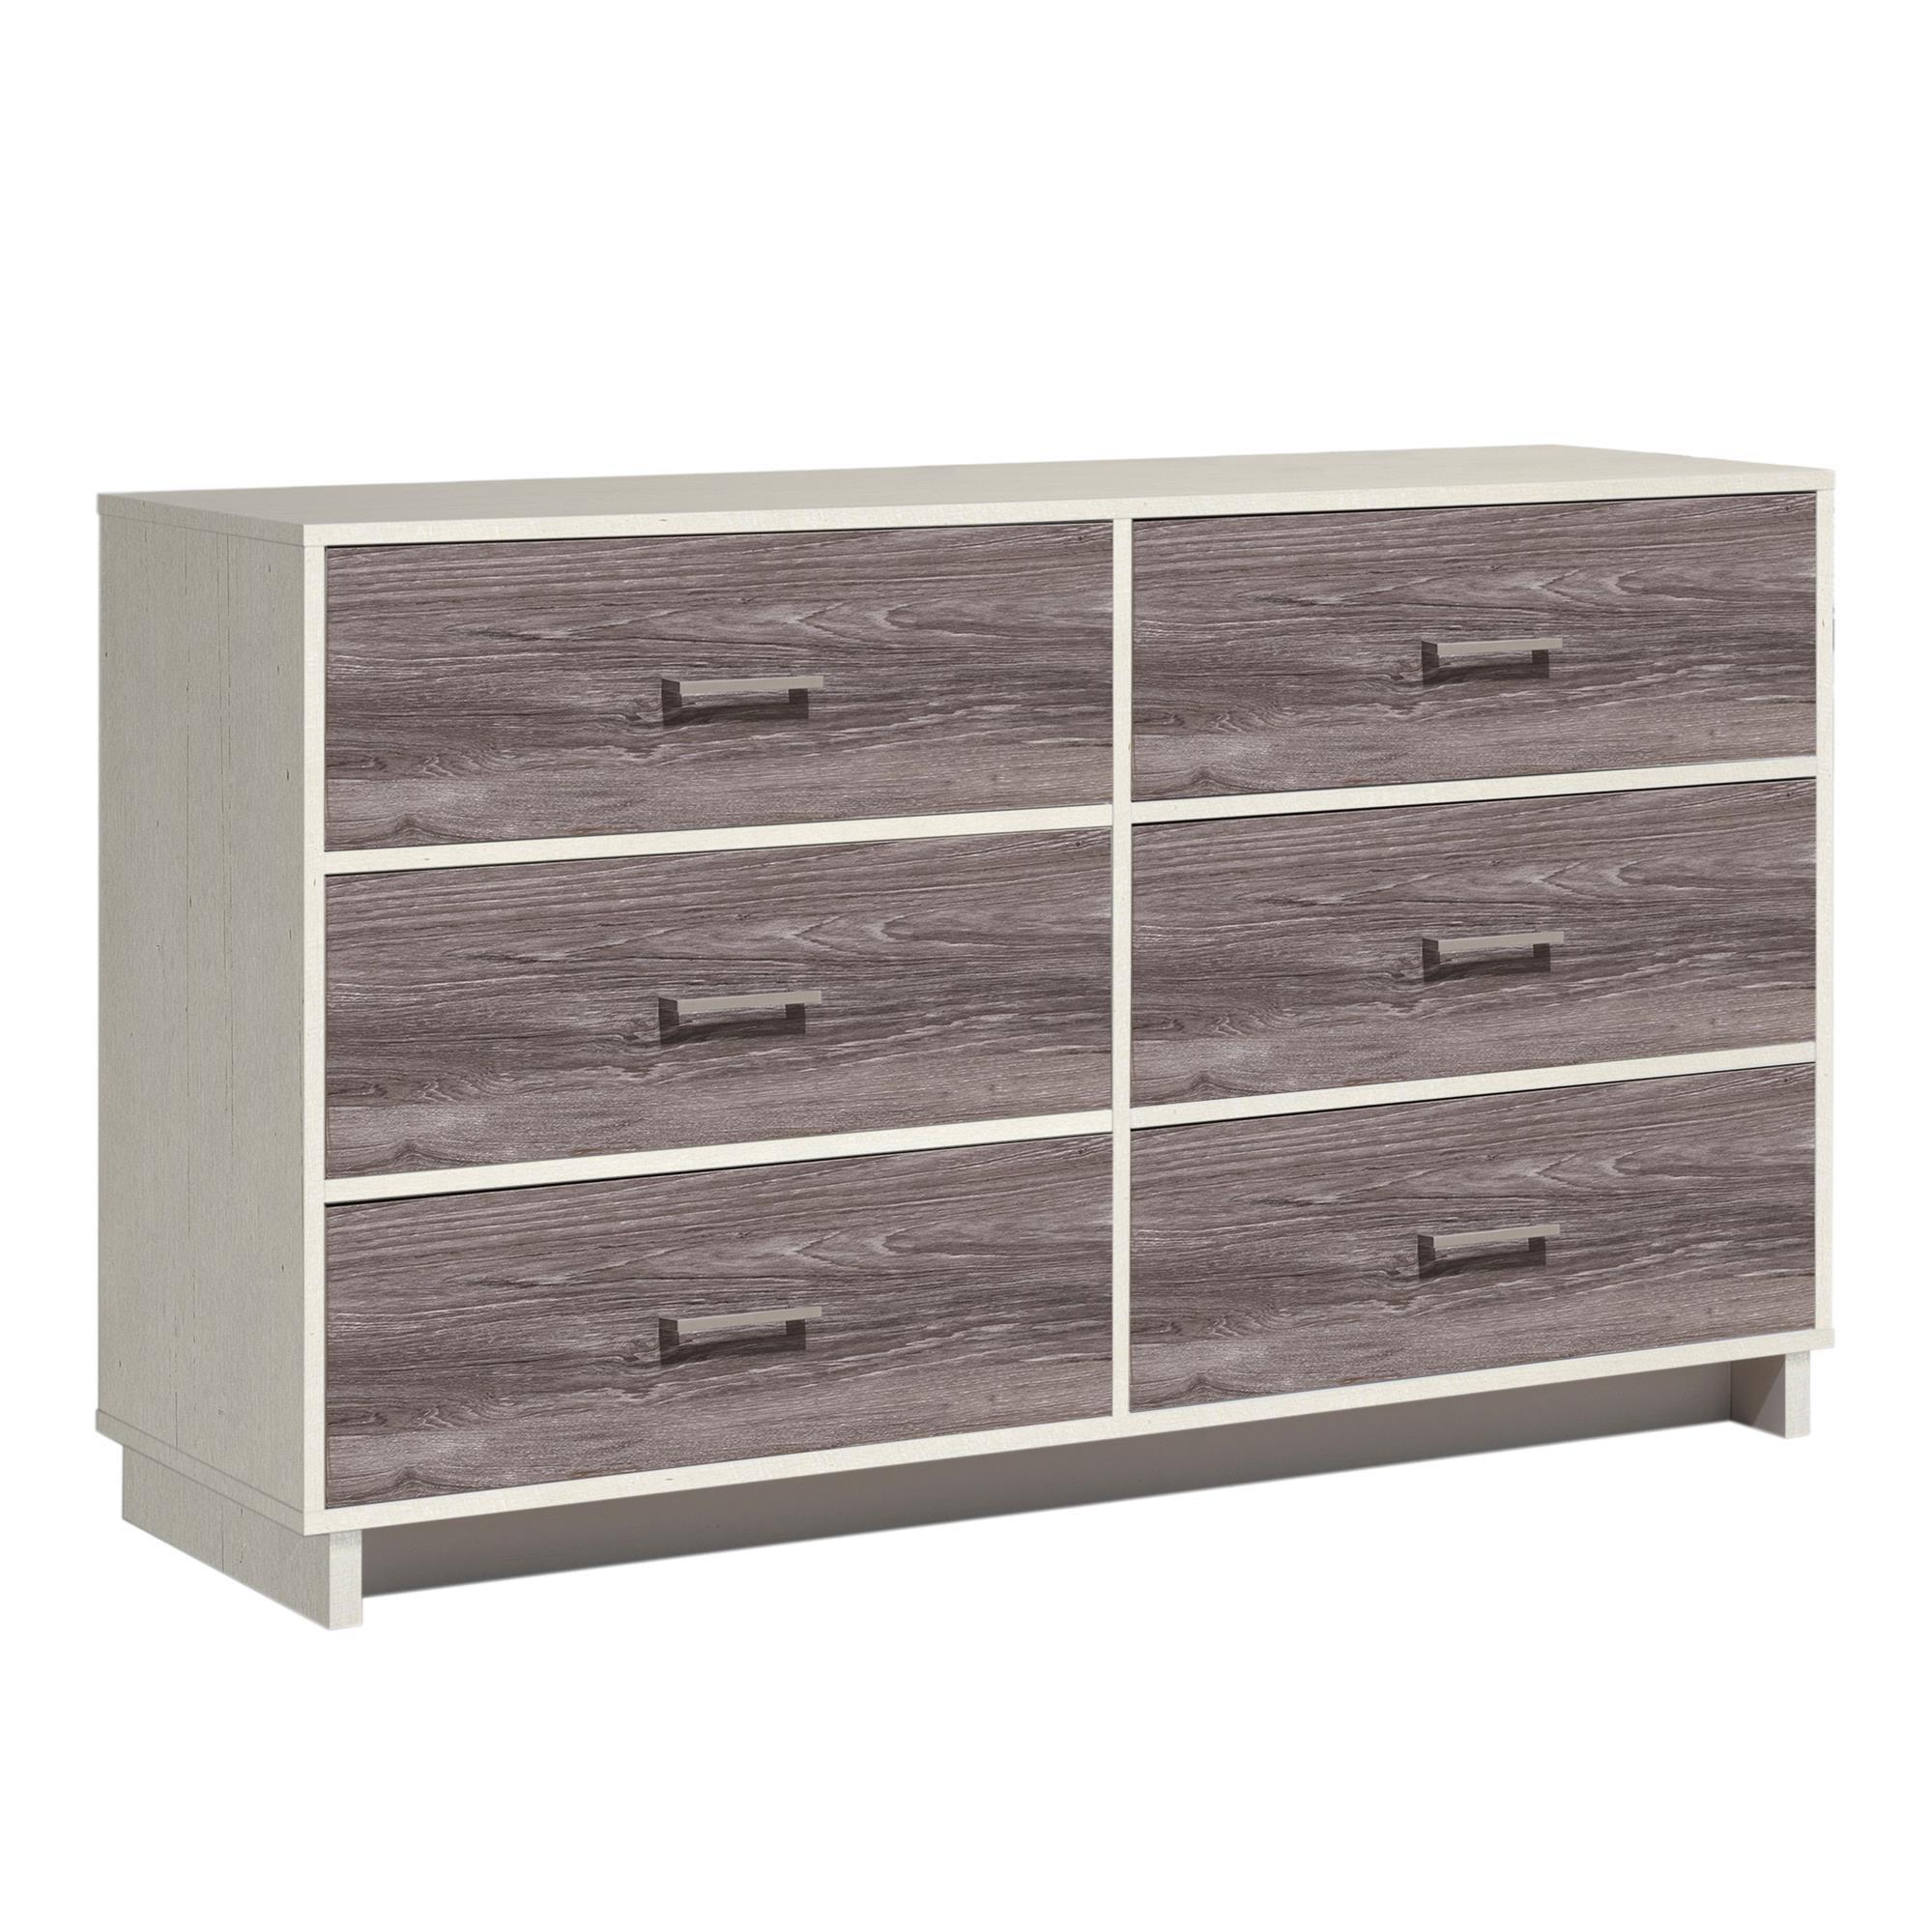 Ameriwood Home Colebrook 6 Drawer Dresser, Vintage White/Rustic by Ameriwood Home